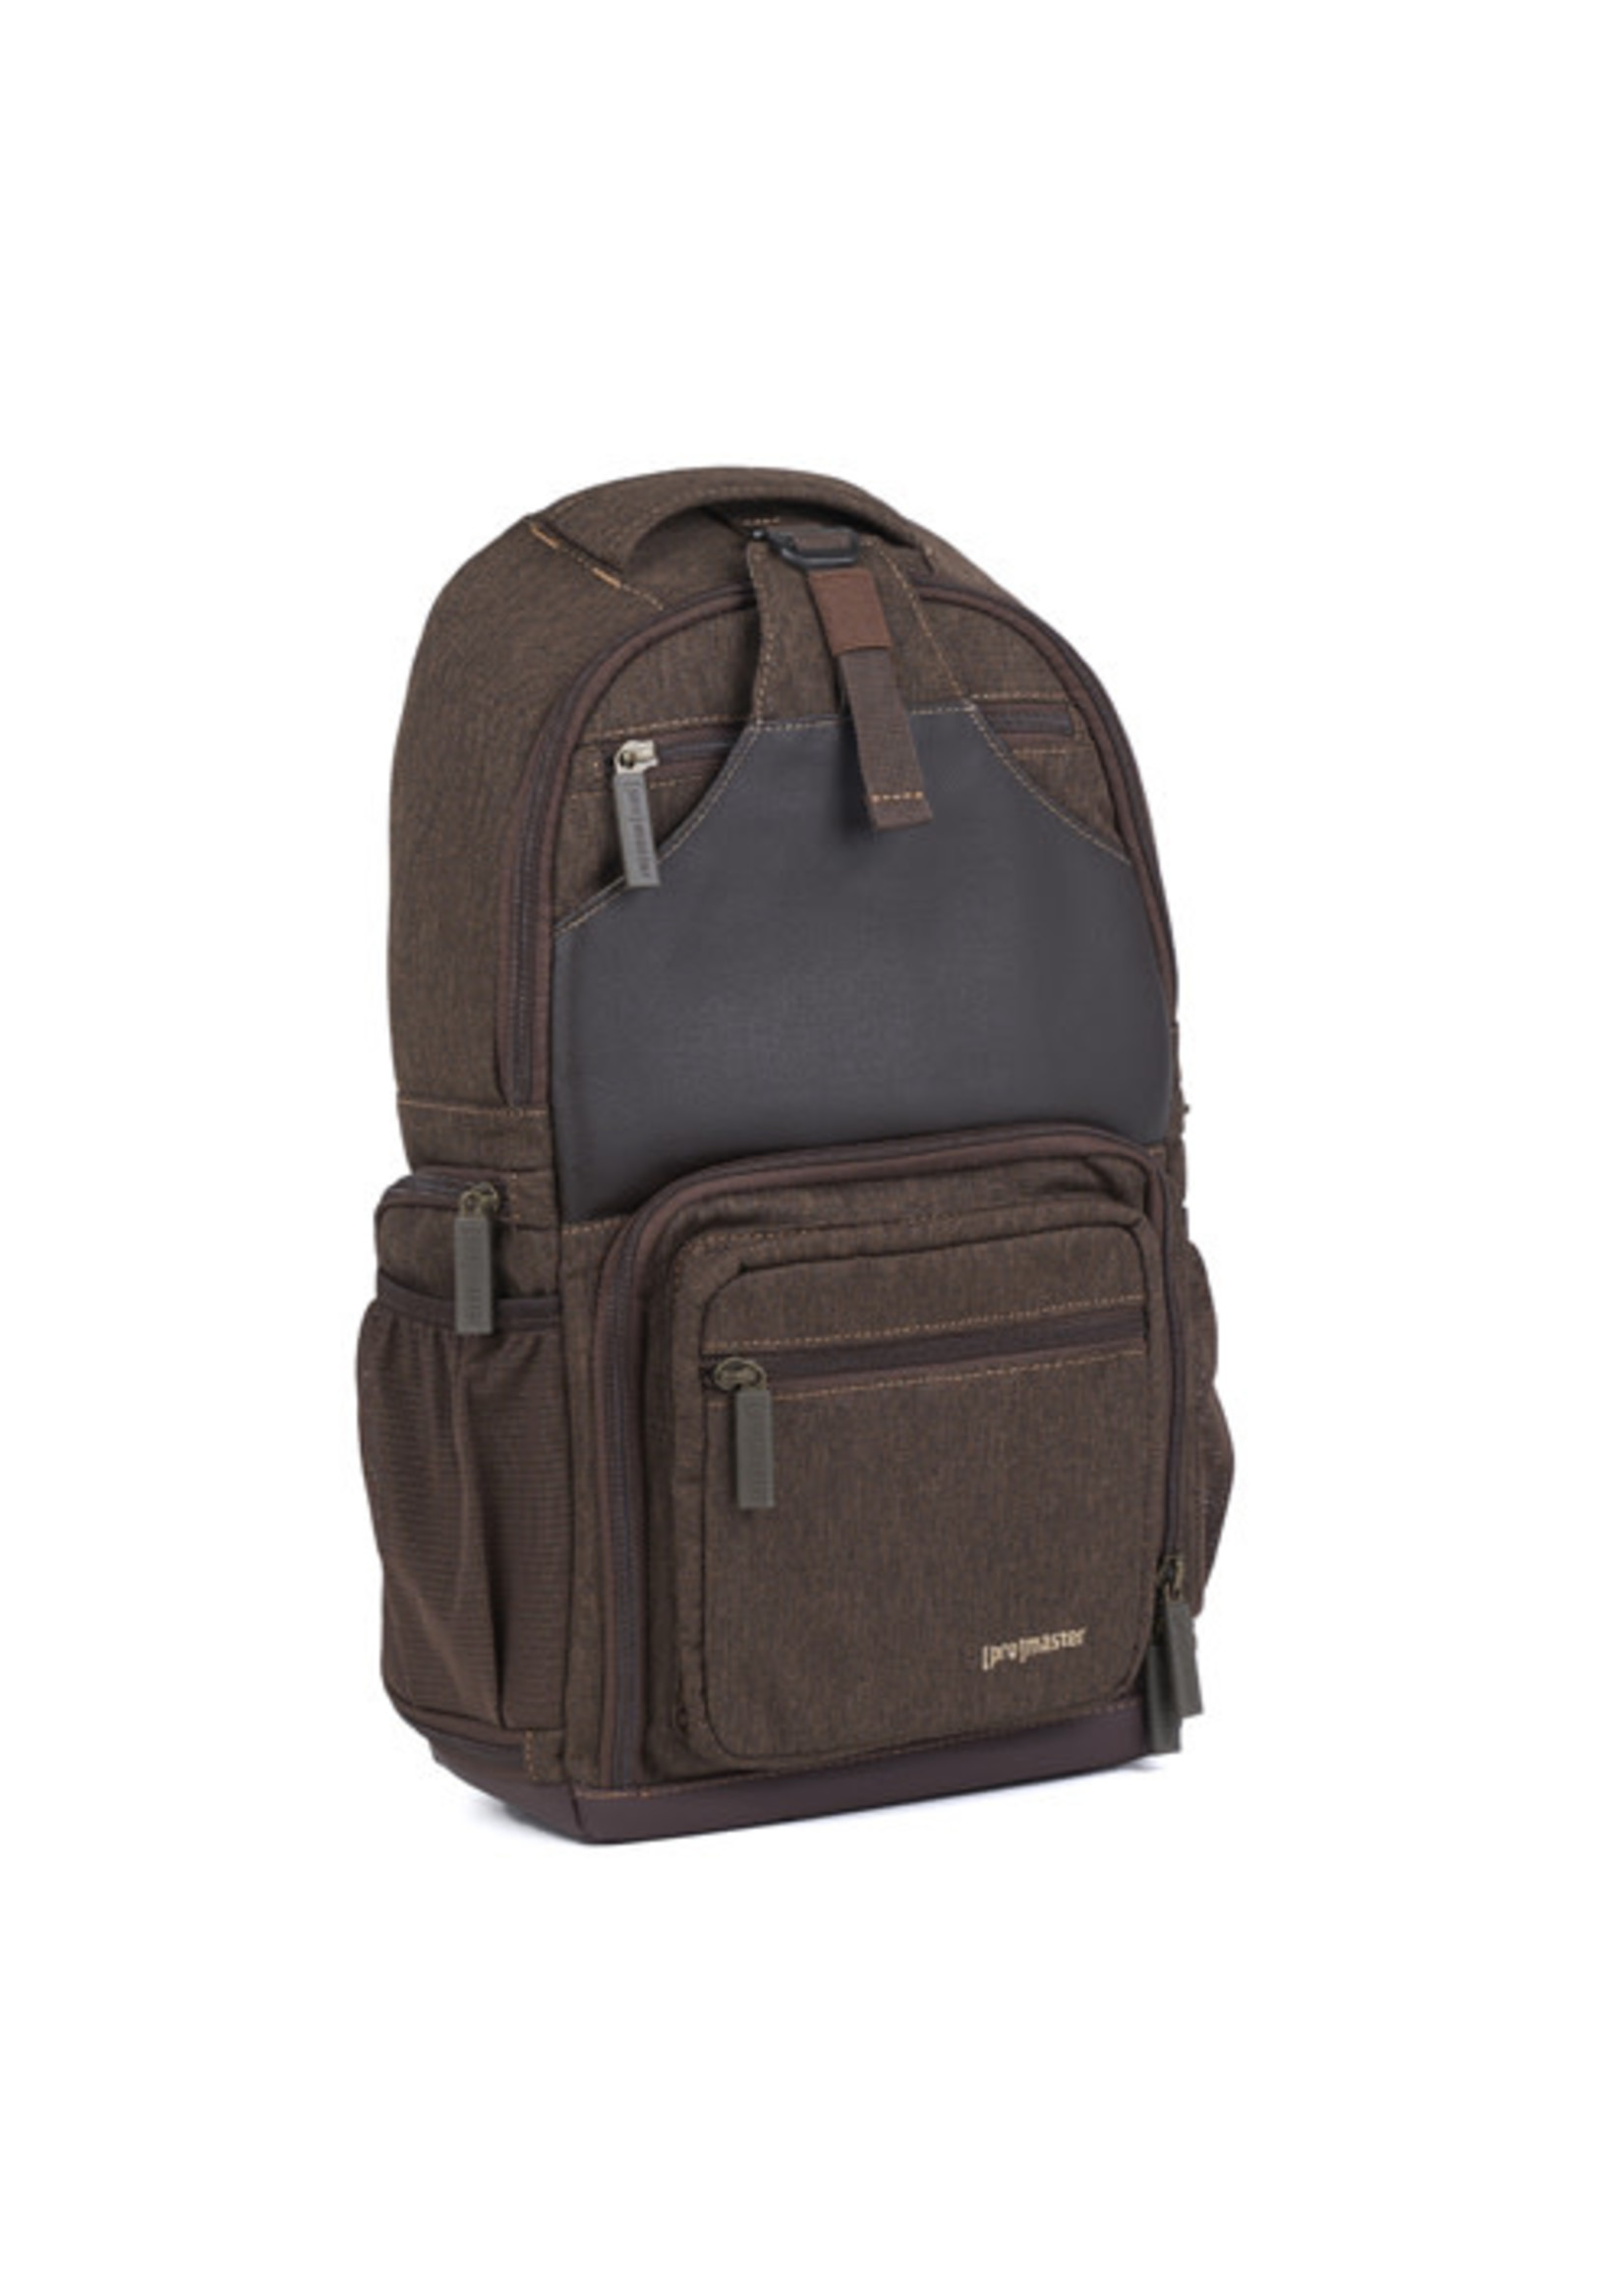 ProMaster ProMaster - Cityscape 54 Sling Bag - Hazelnut